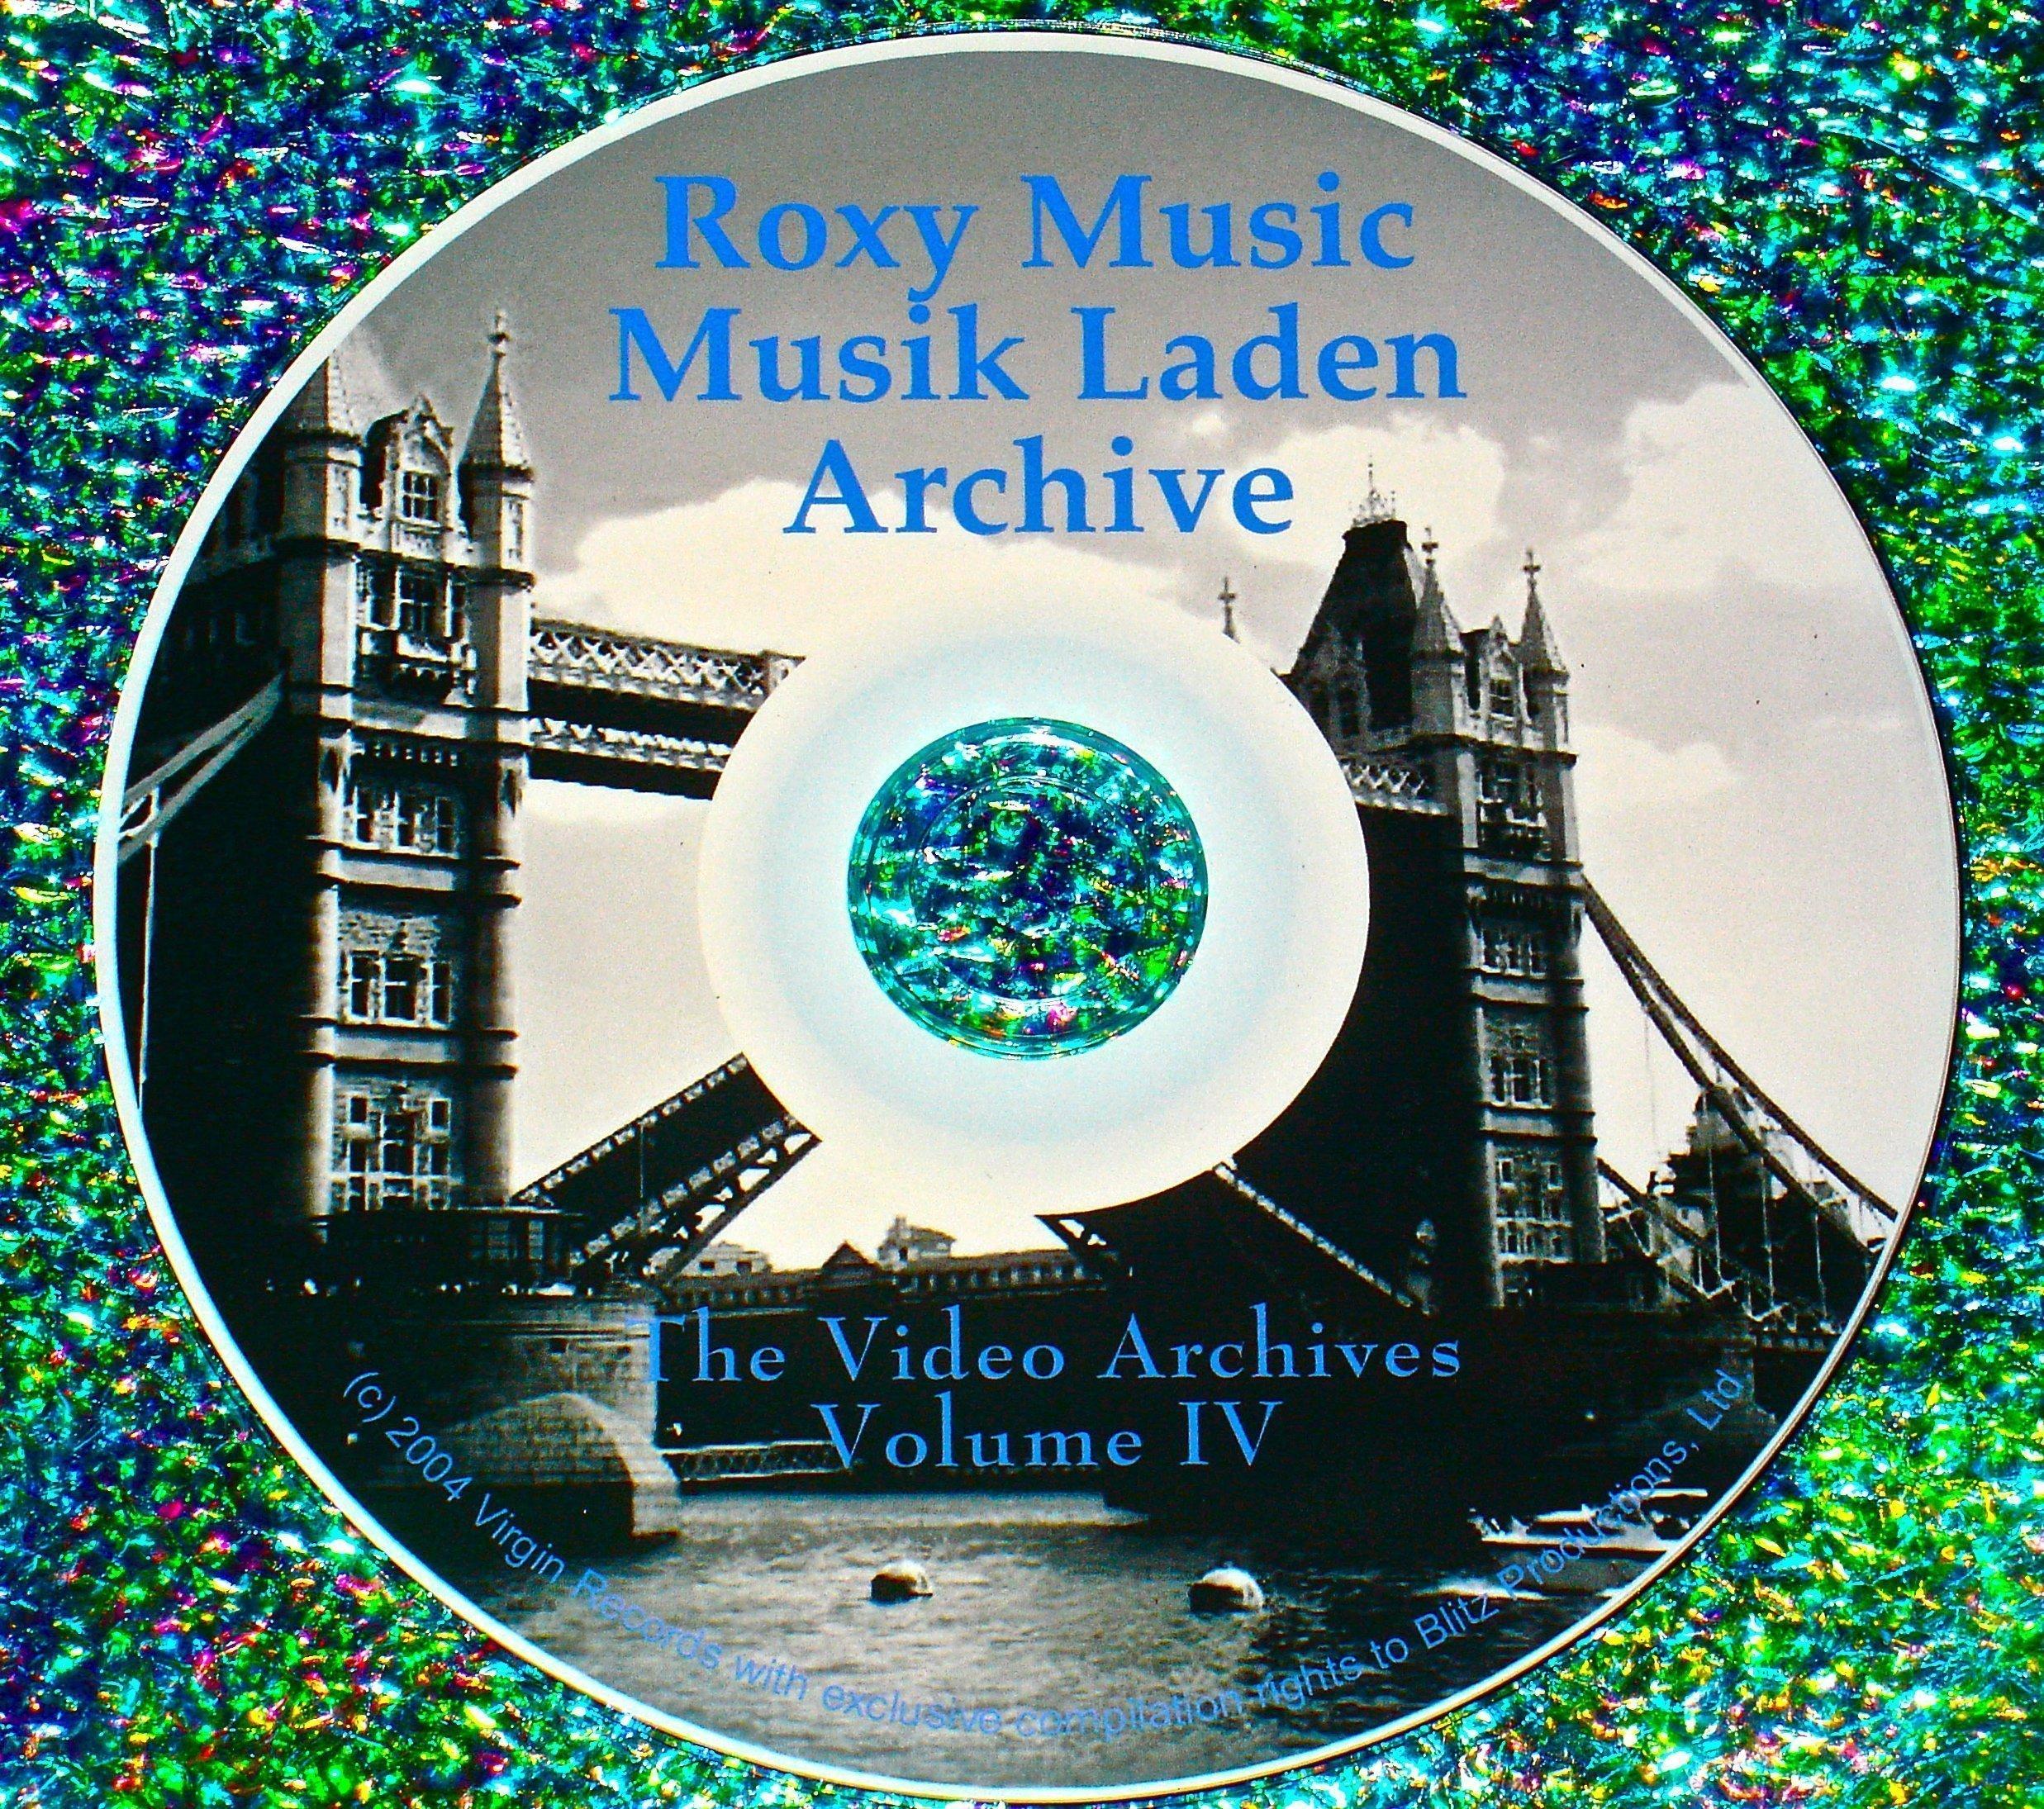 Roxy Music (Bryan Ferry): MusikLaden Germany Video Archives Volume IV